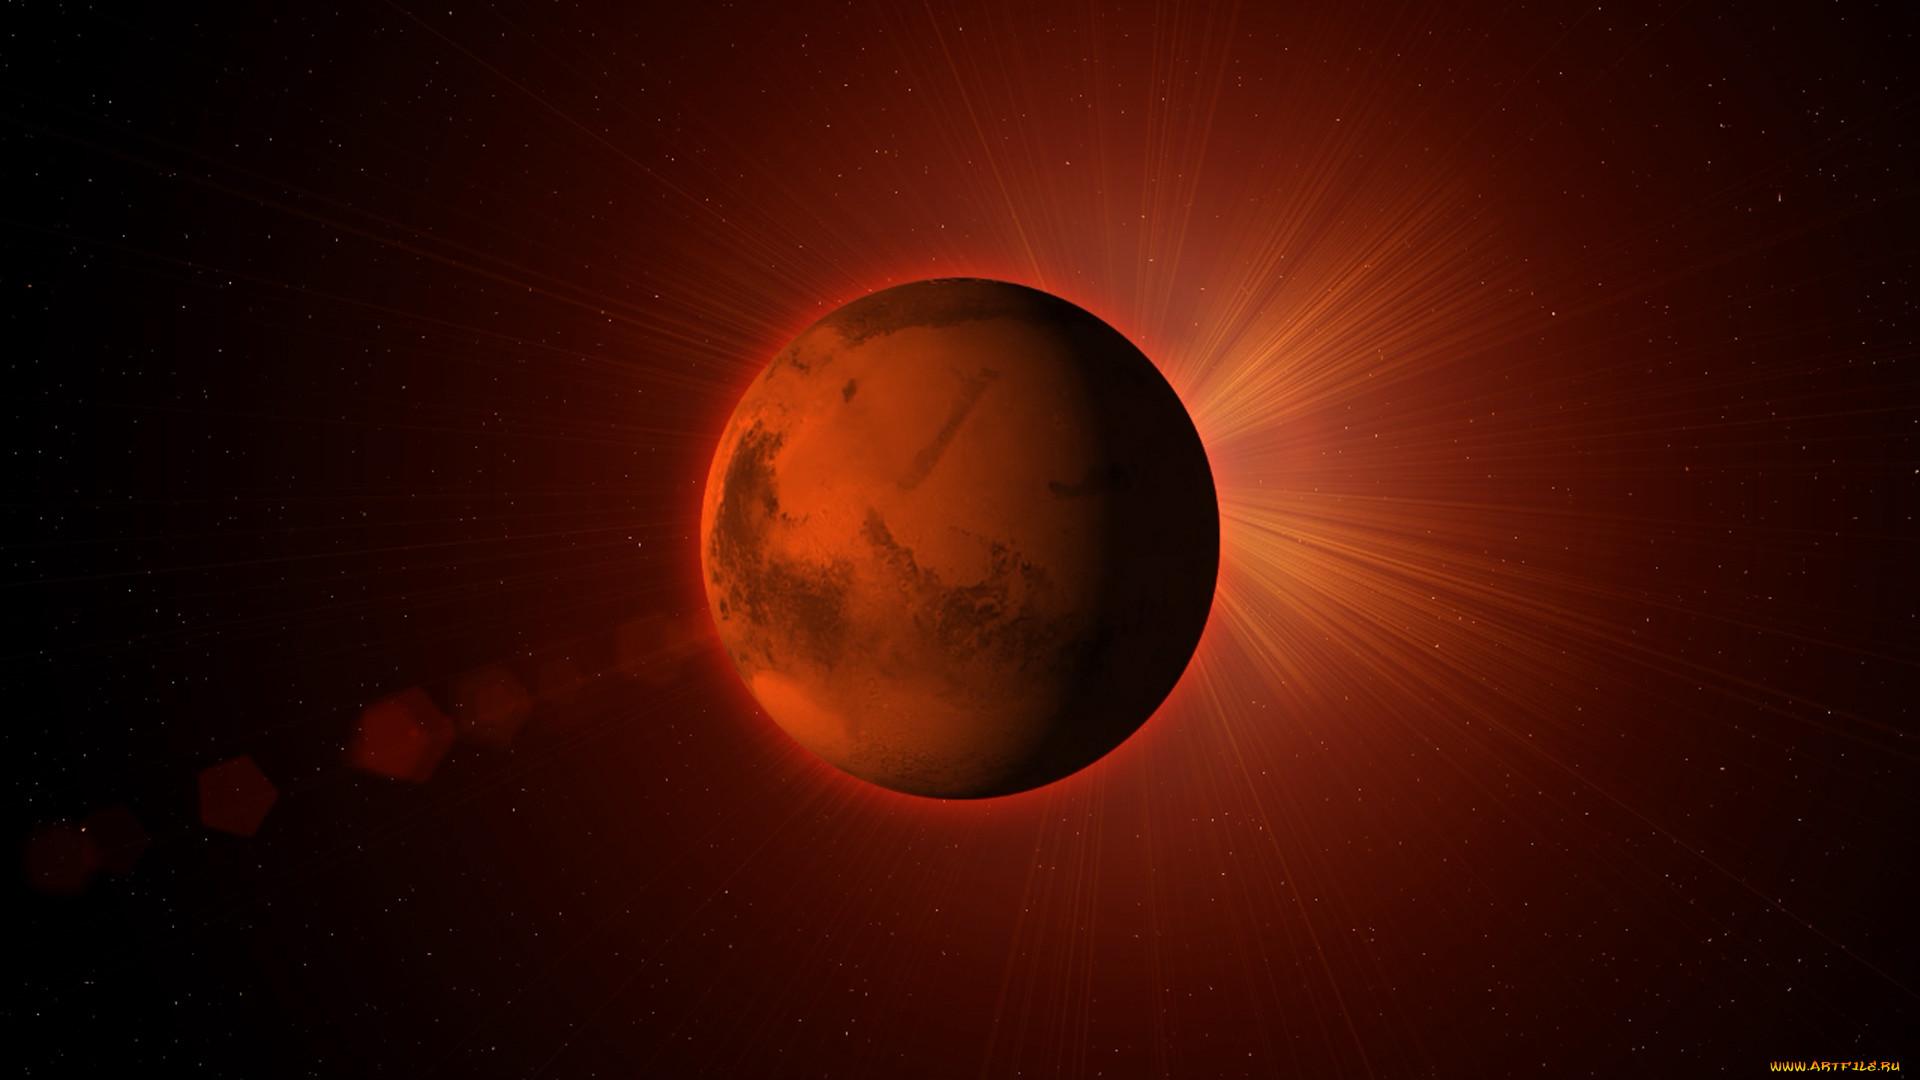 mars, космос, марс, планета